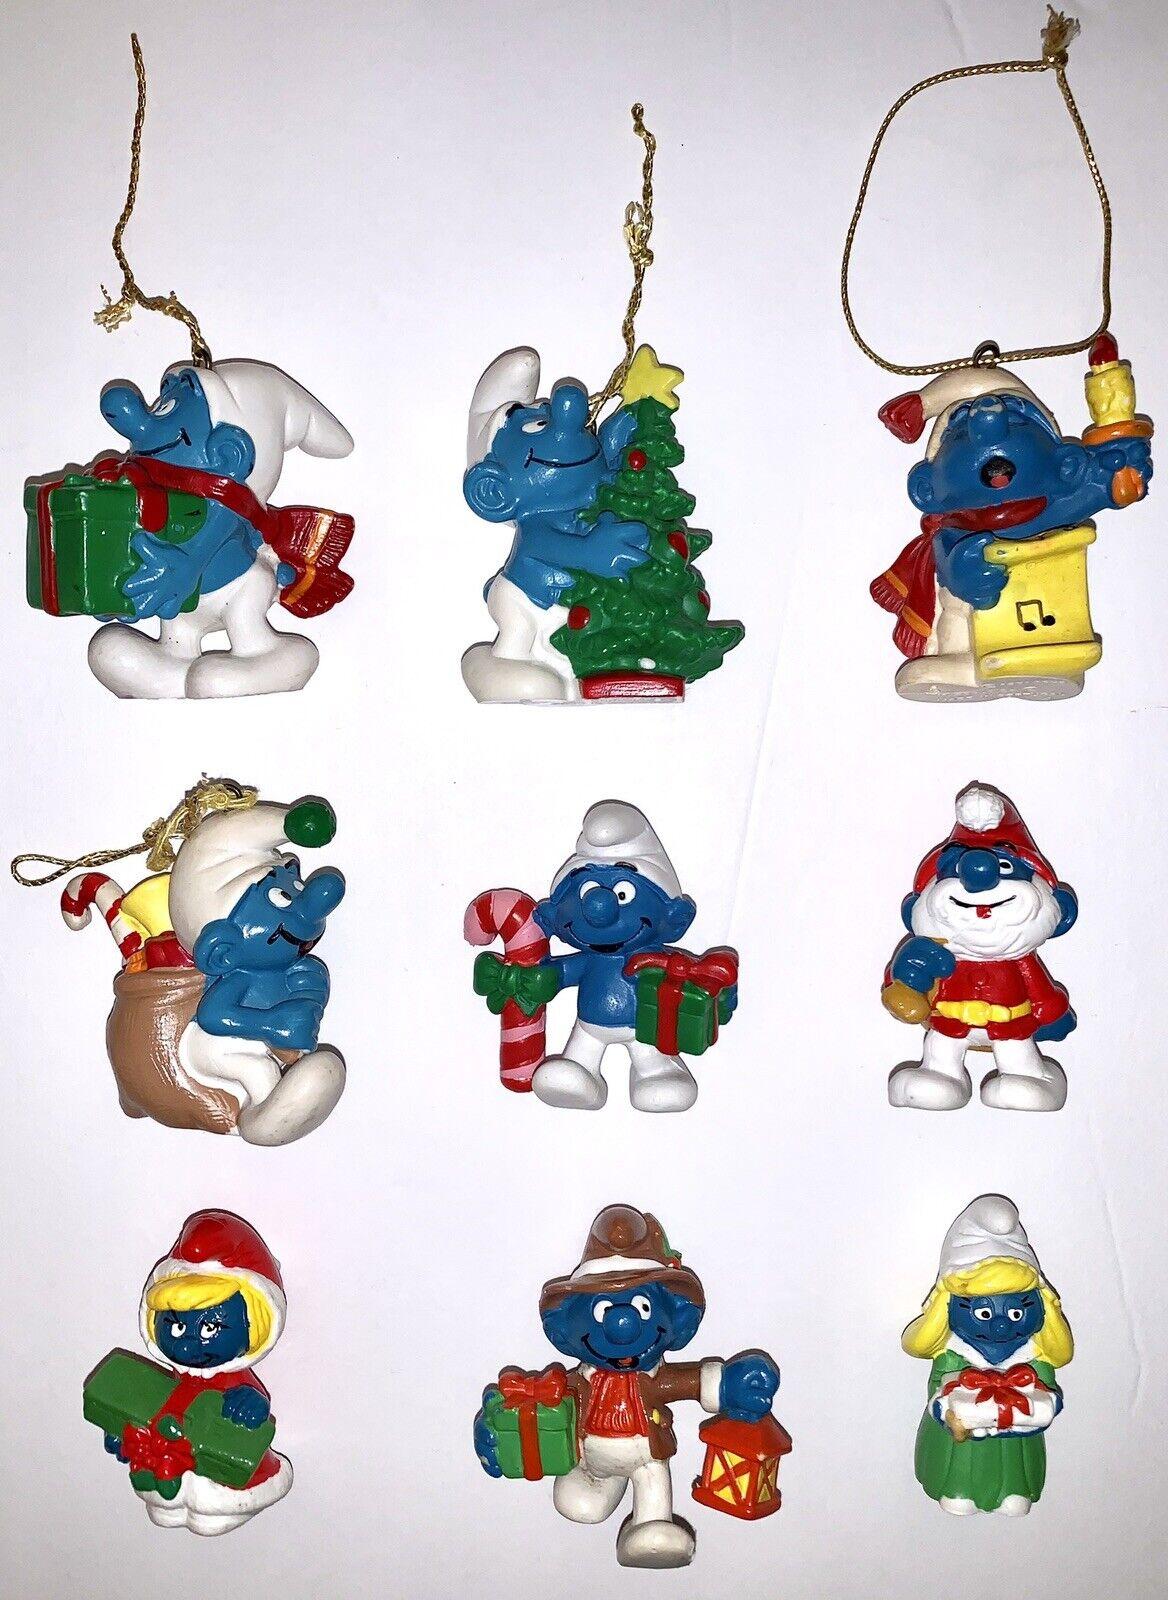 RARE Vintage 80's Smurfs Christmas PVC Figures & OrnaSiets Lot  Peyo Schleich